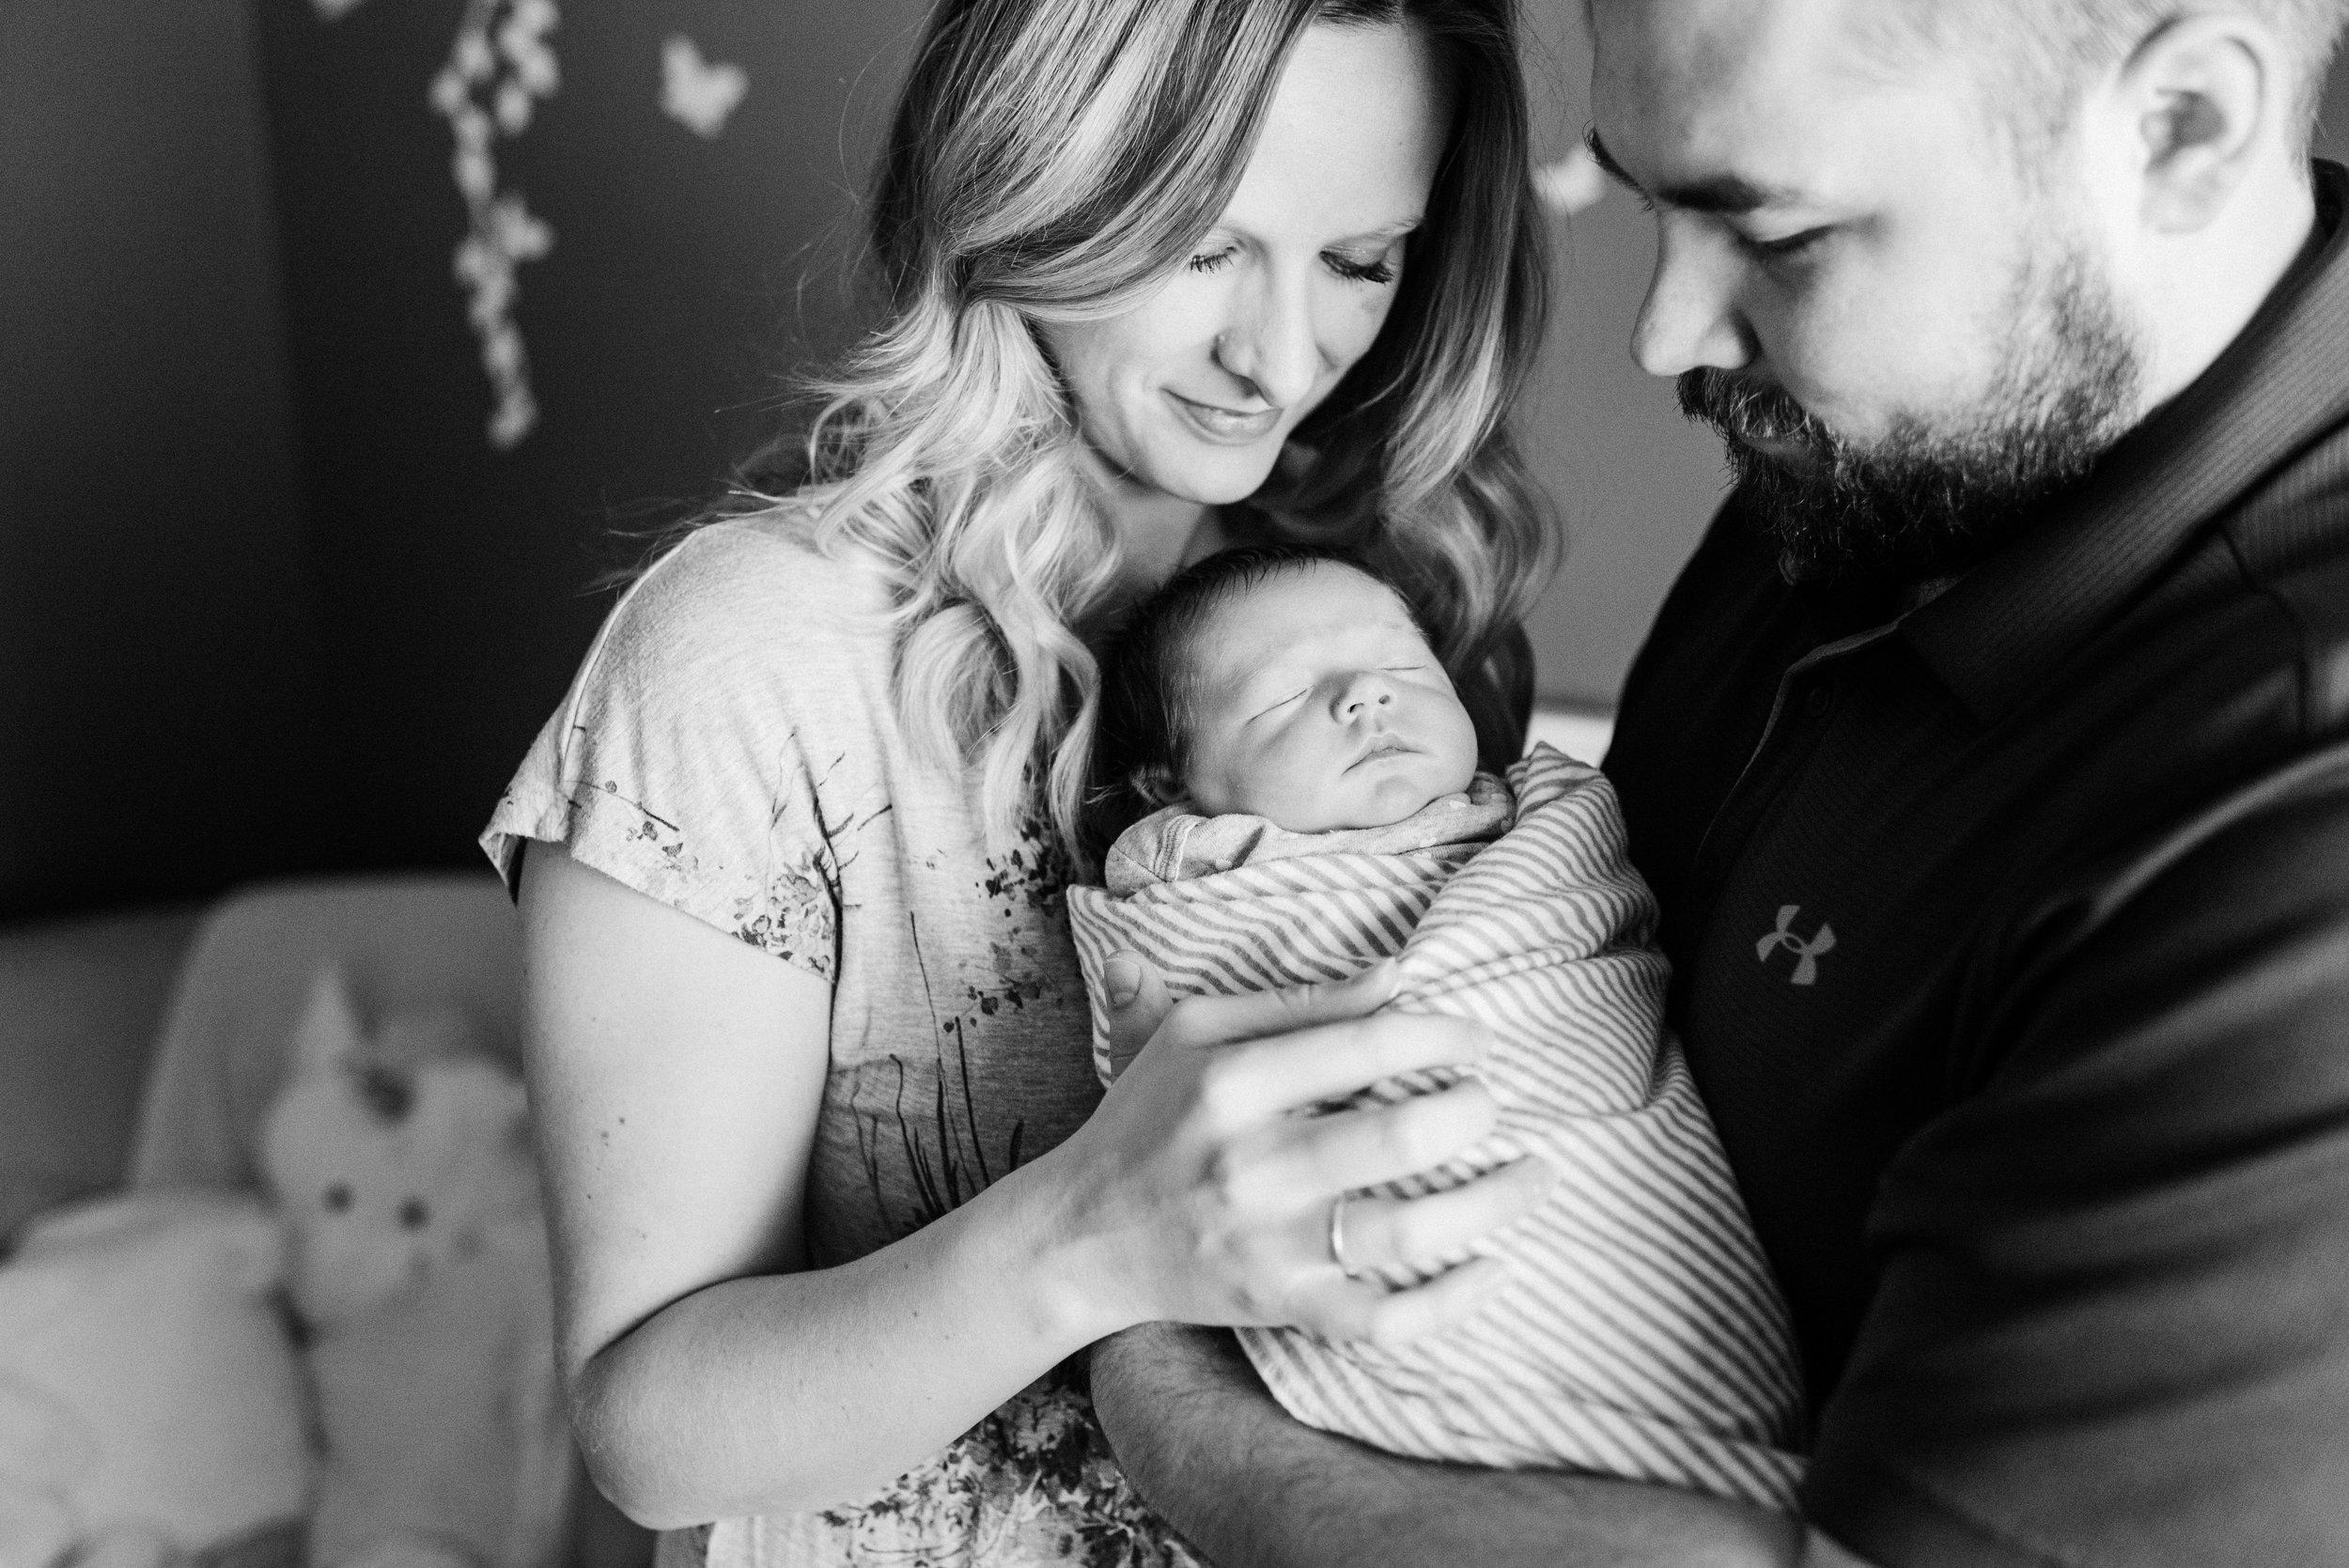 spokane-newborn-session-2.jpg